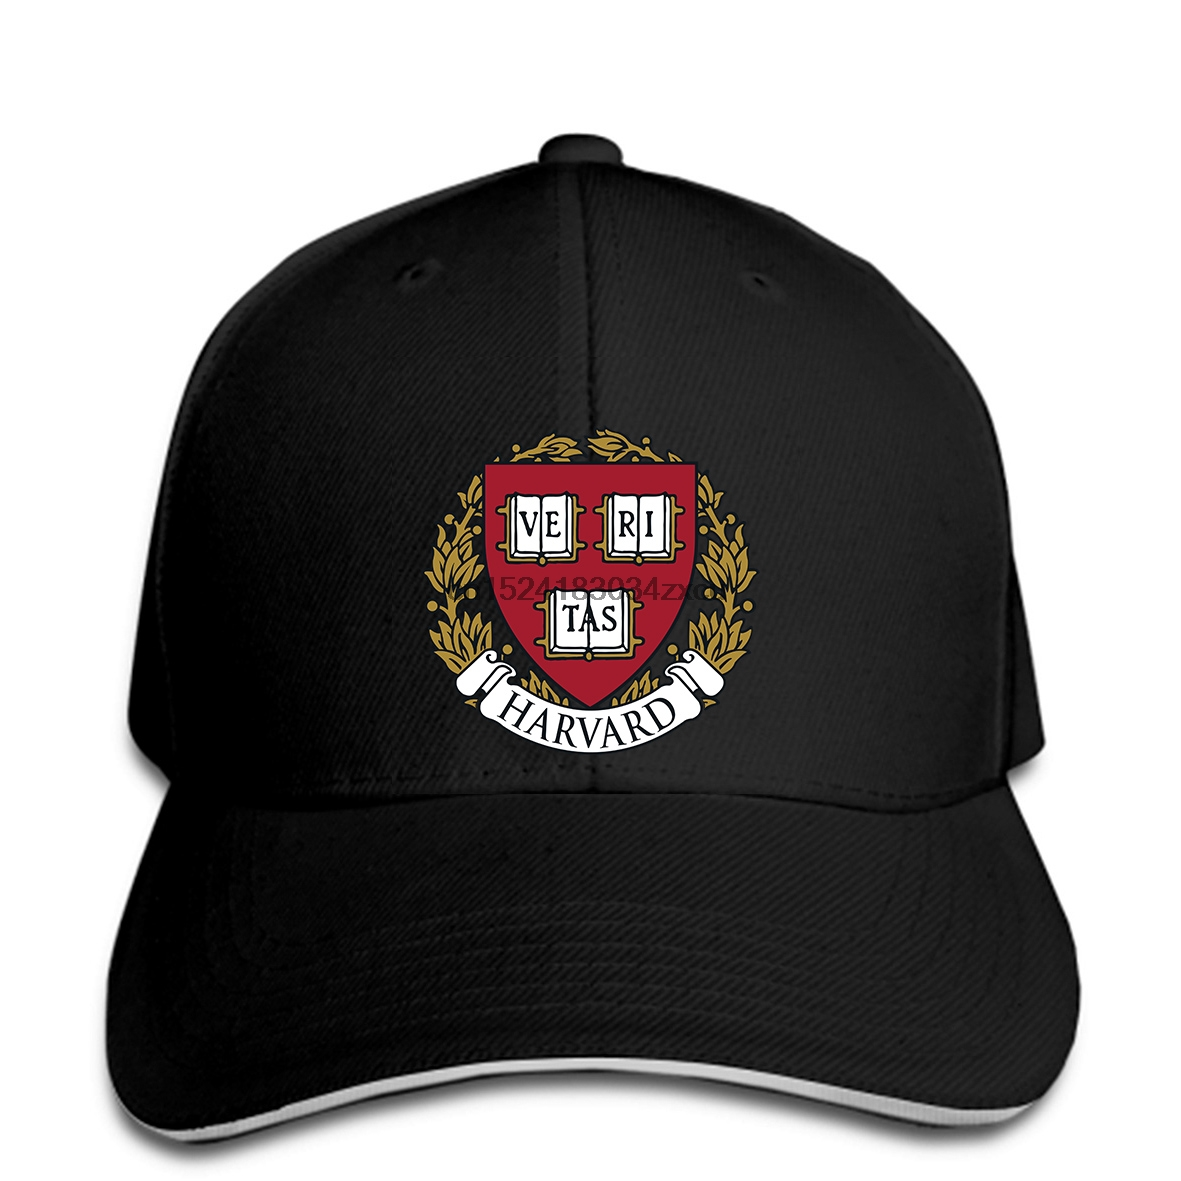 Delicious Baseball Cap New Harvard Famous University Logo Men S Black Snapbackhatpeaked Refreshing And Enriching The Saliva